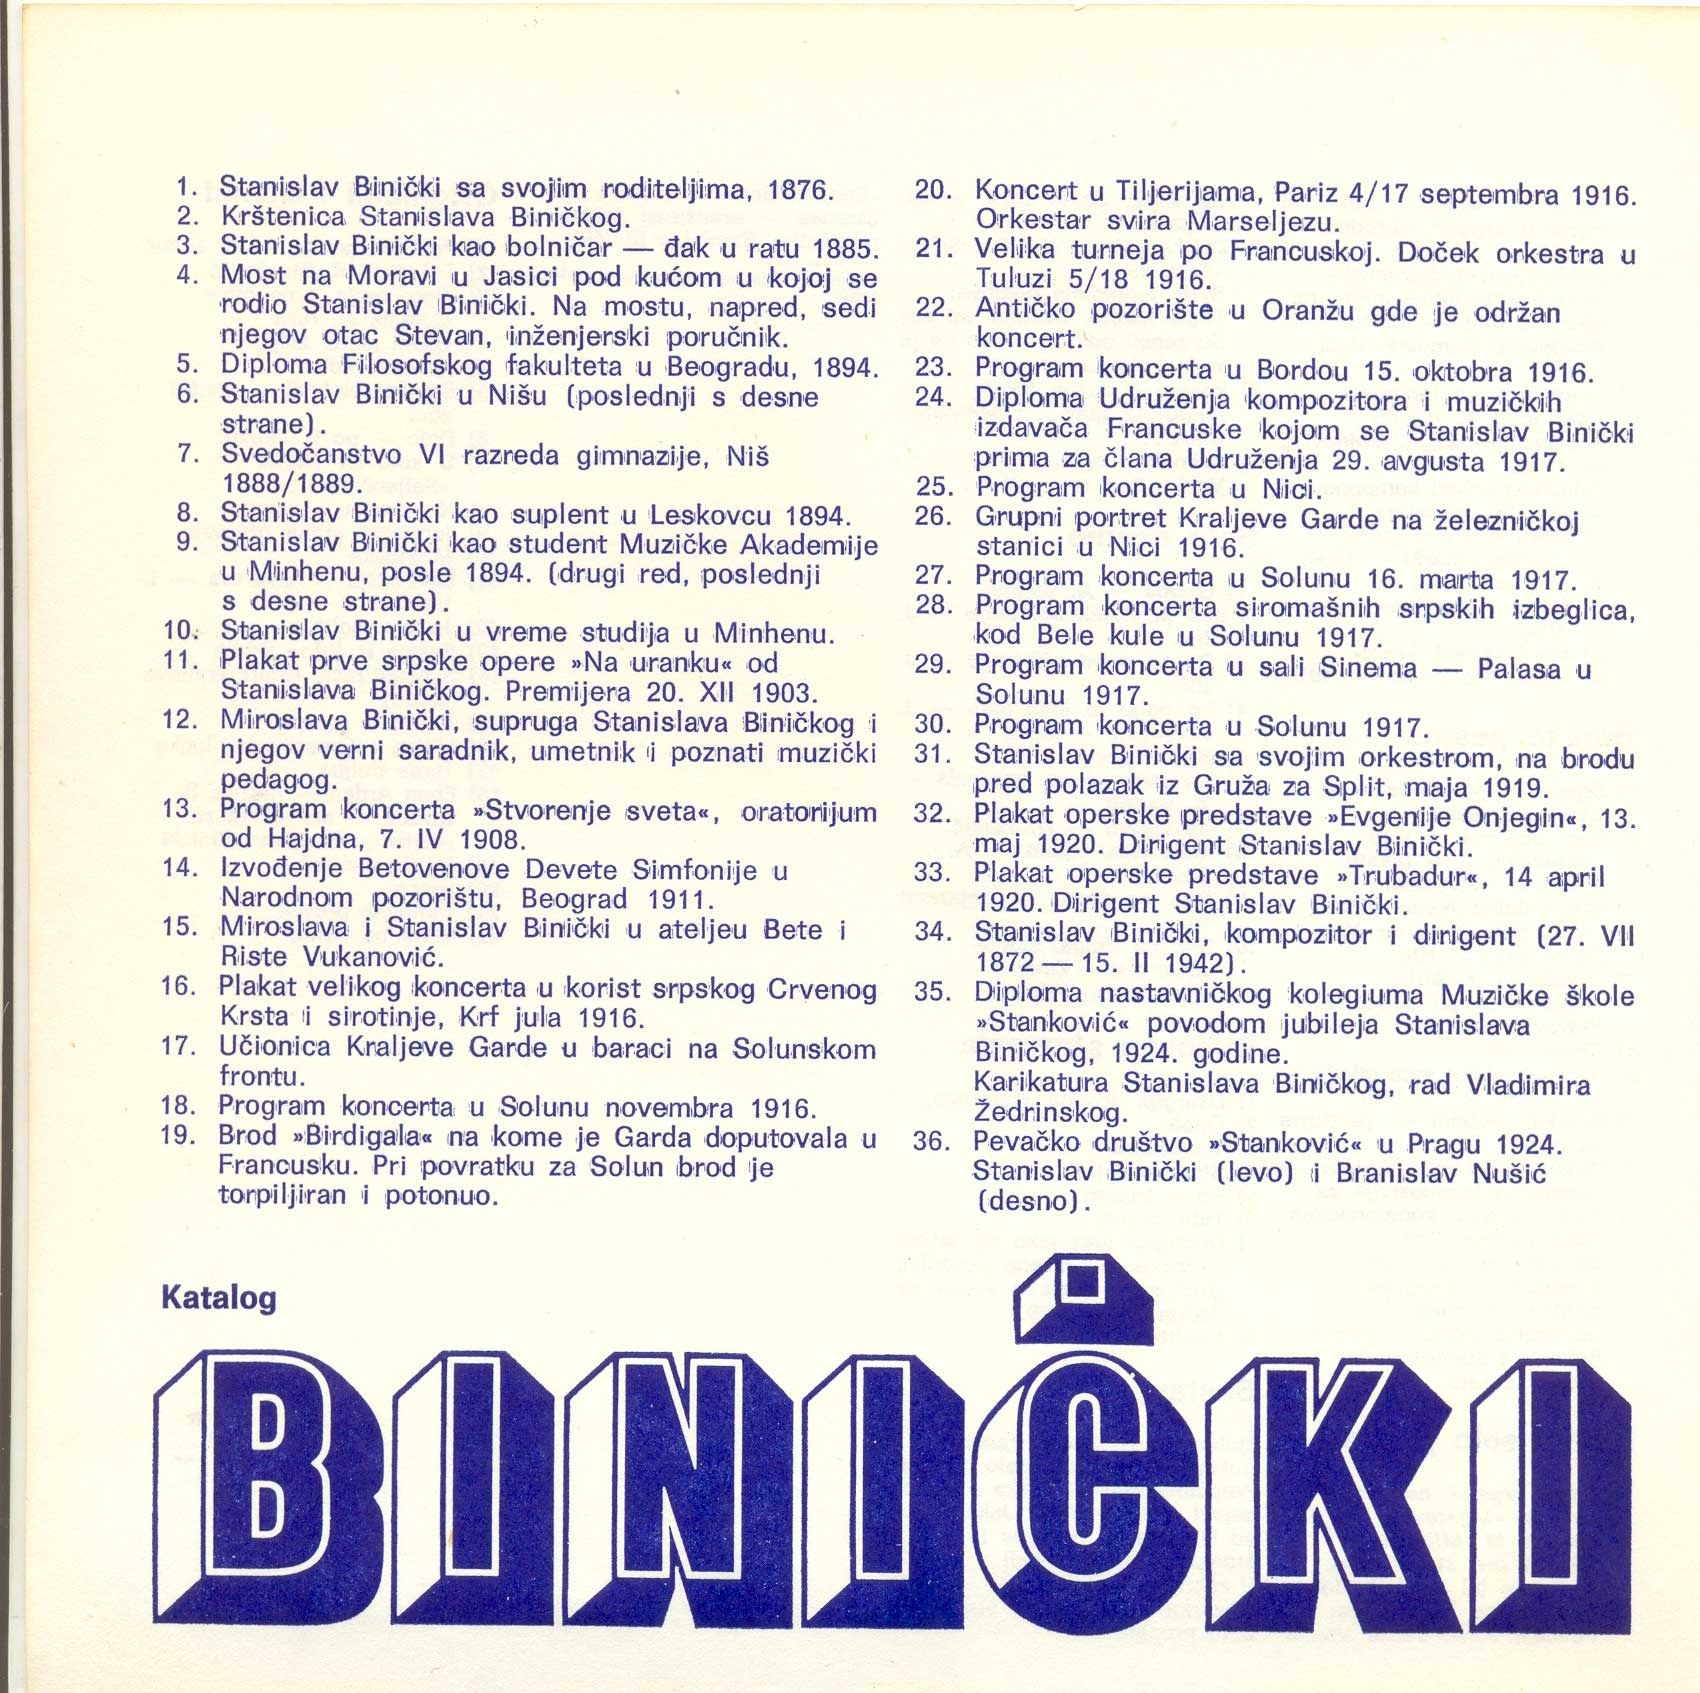 stanislav-binicki-katalog-1973-25